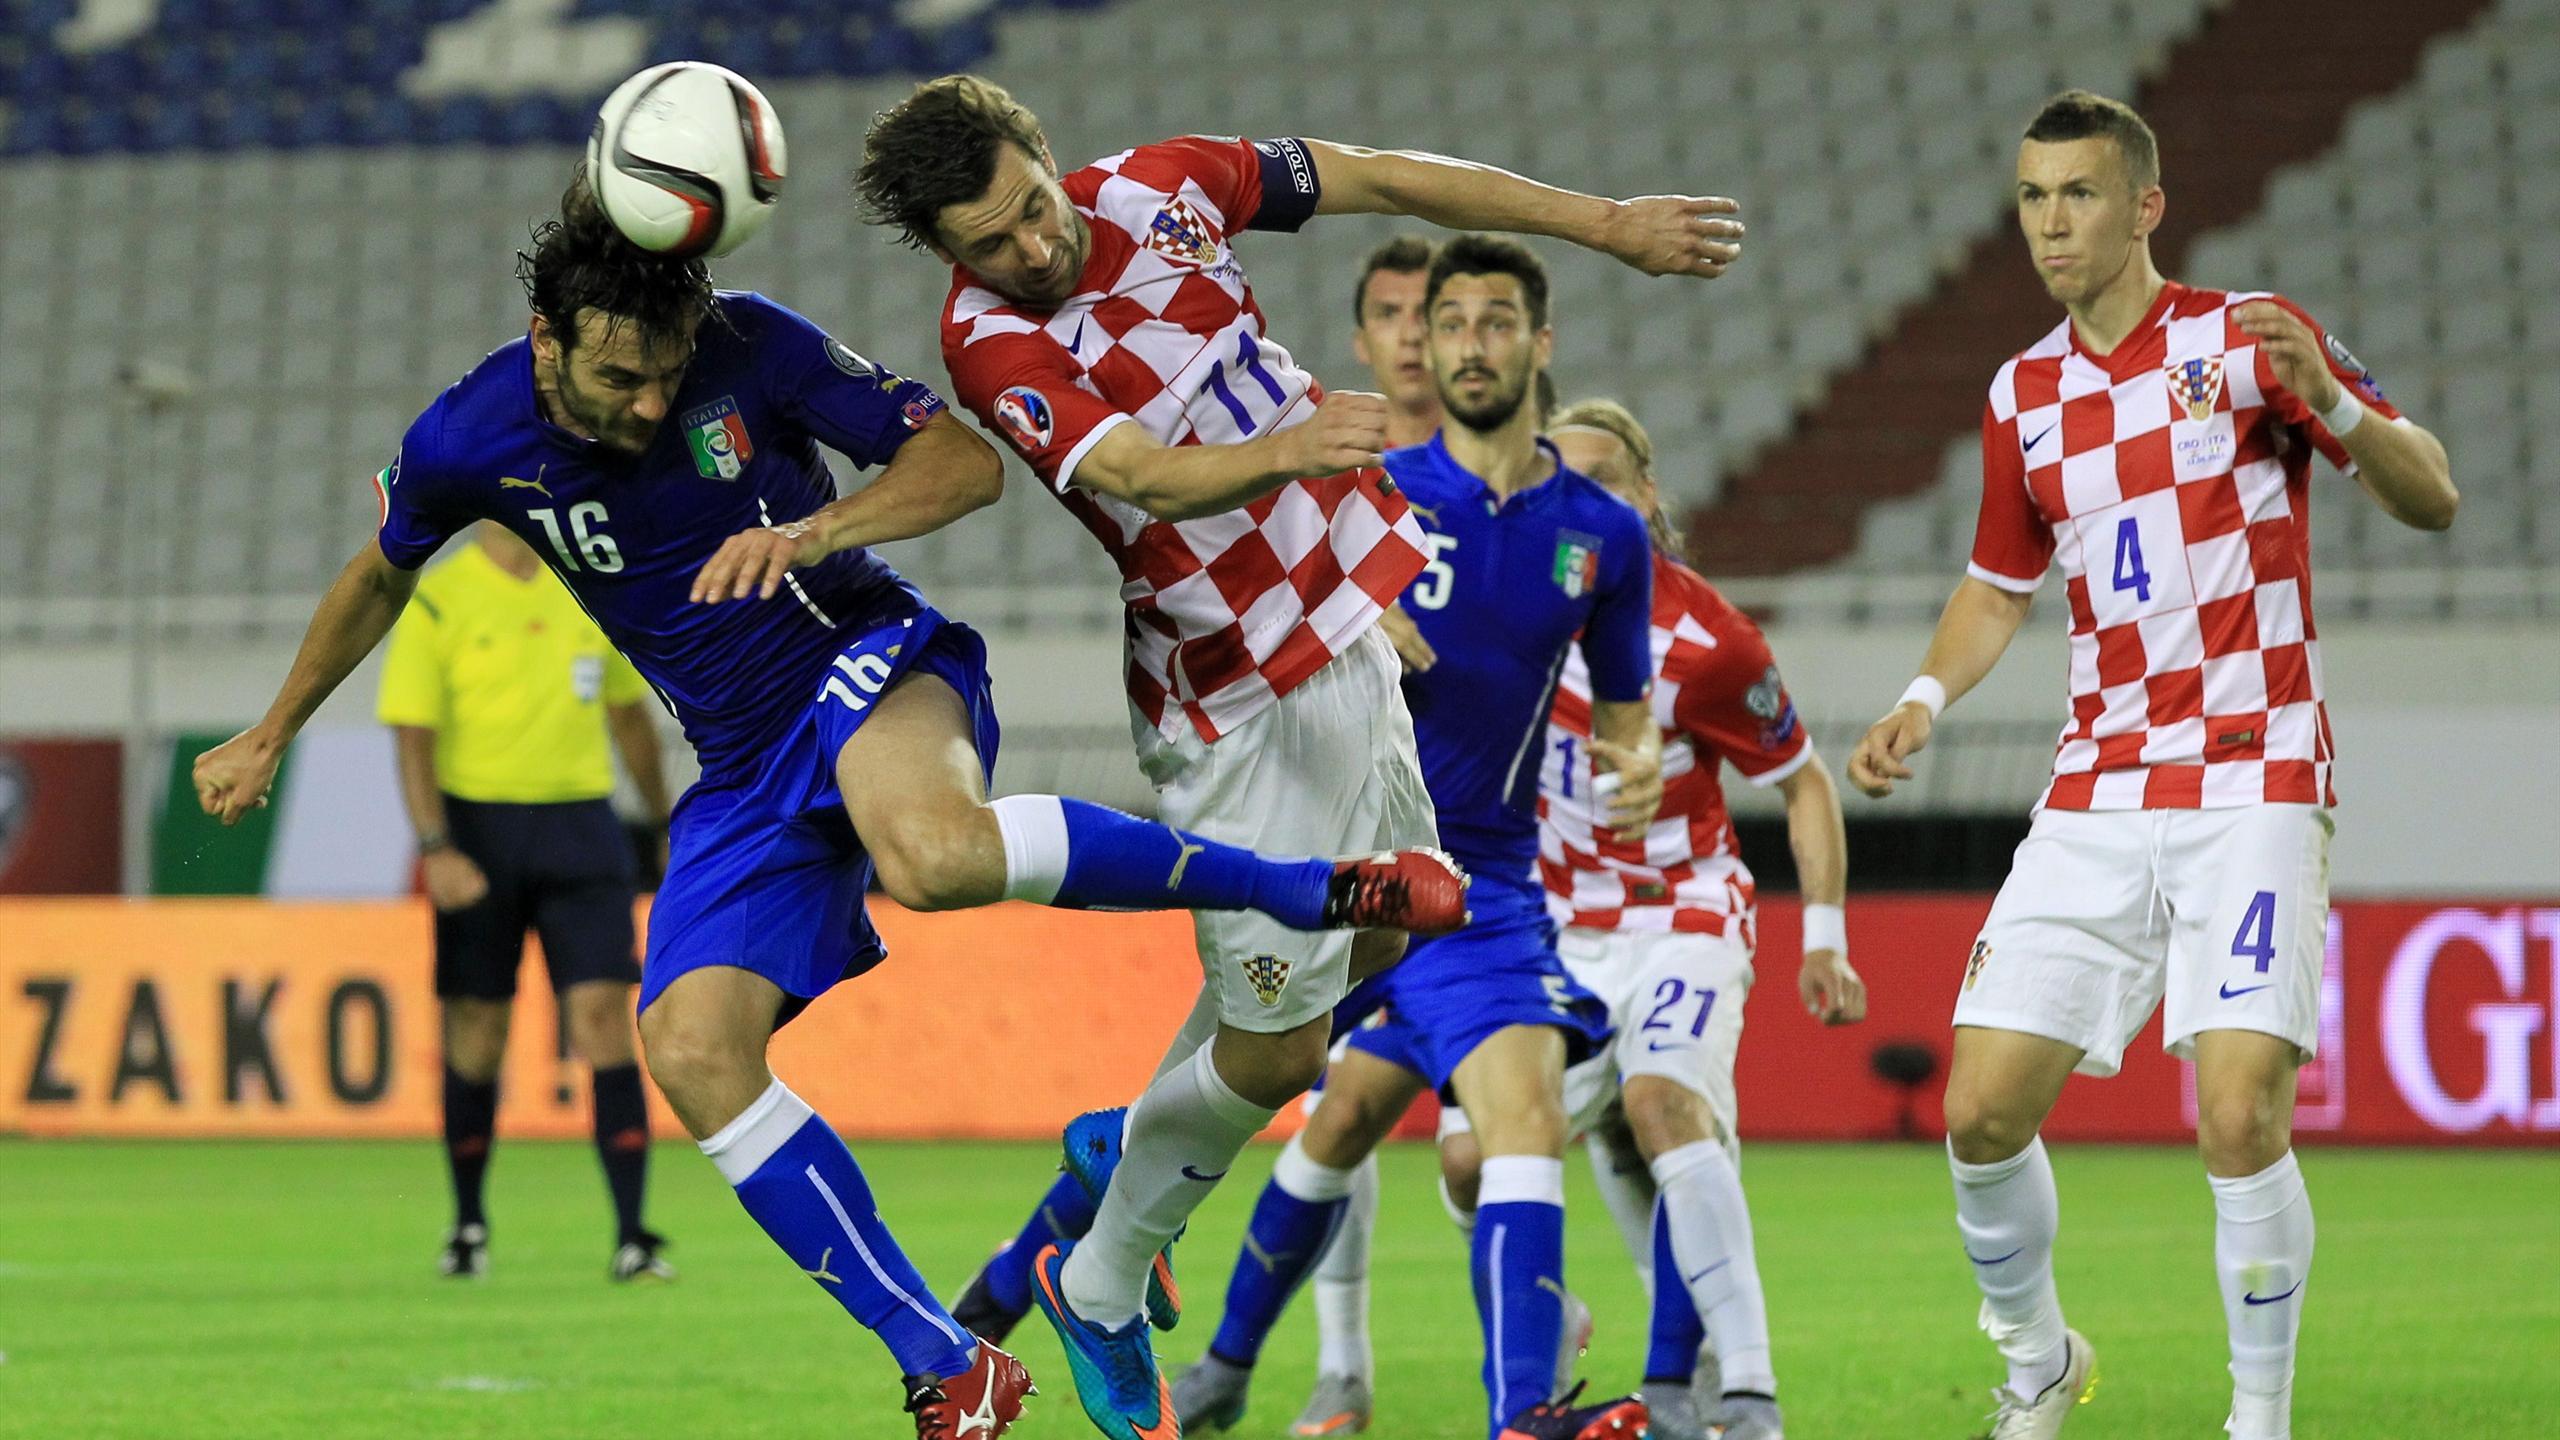 Italy's Marco Parolo (L) heads the ball past Croatia's Darijo Srna